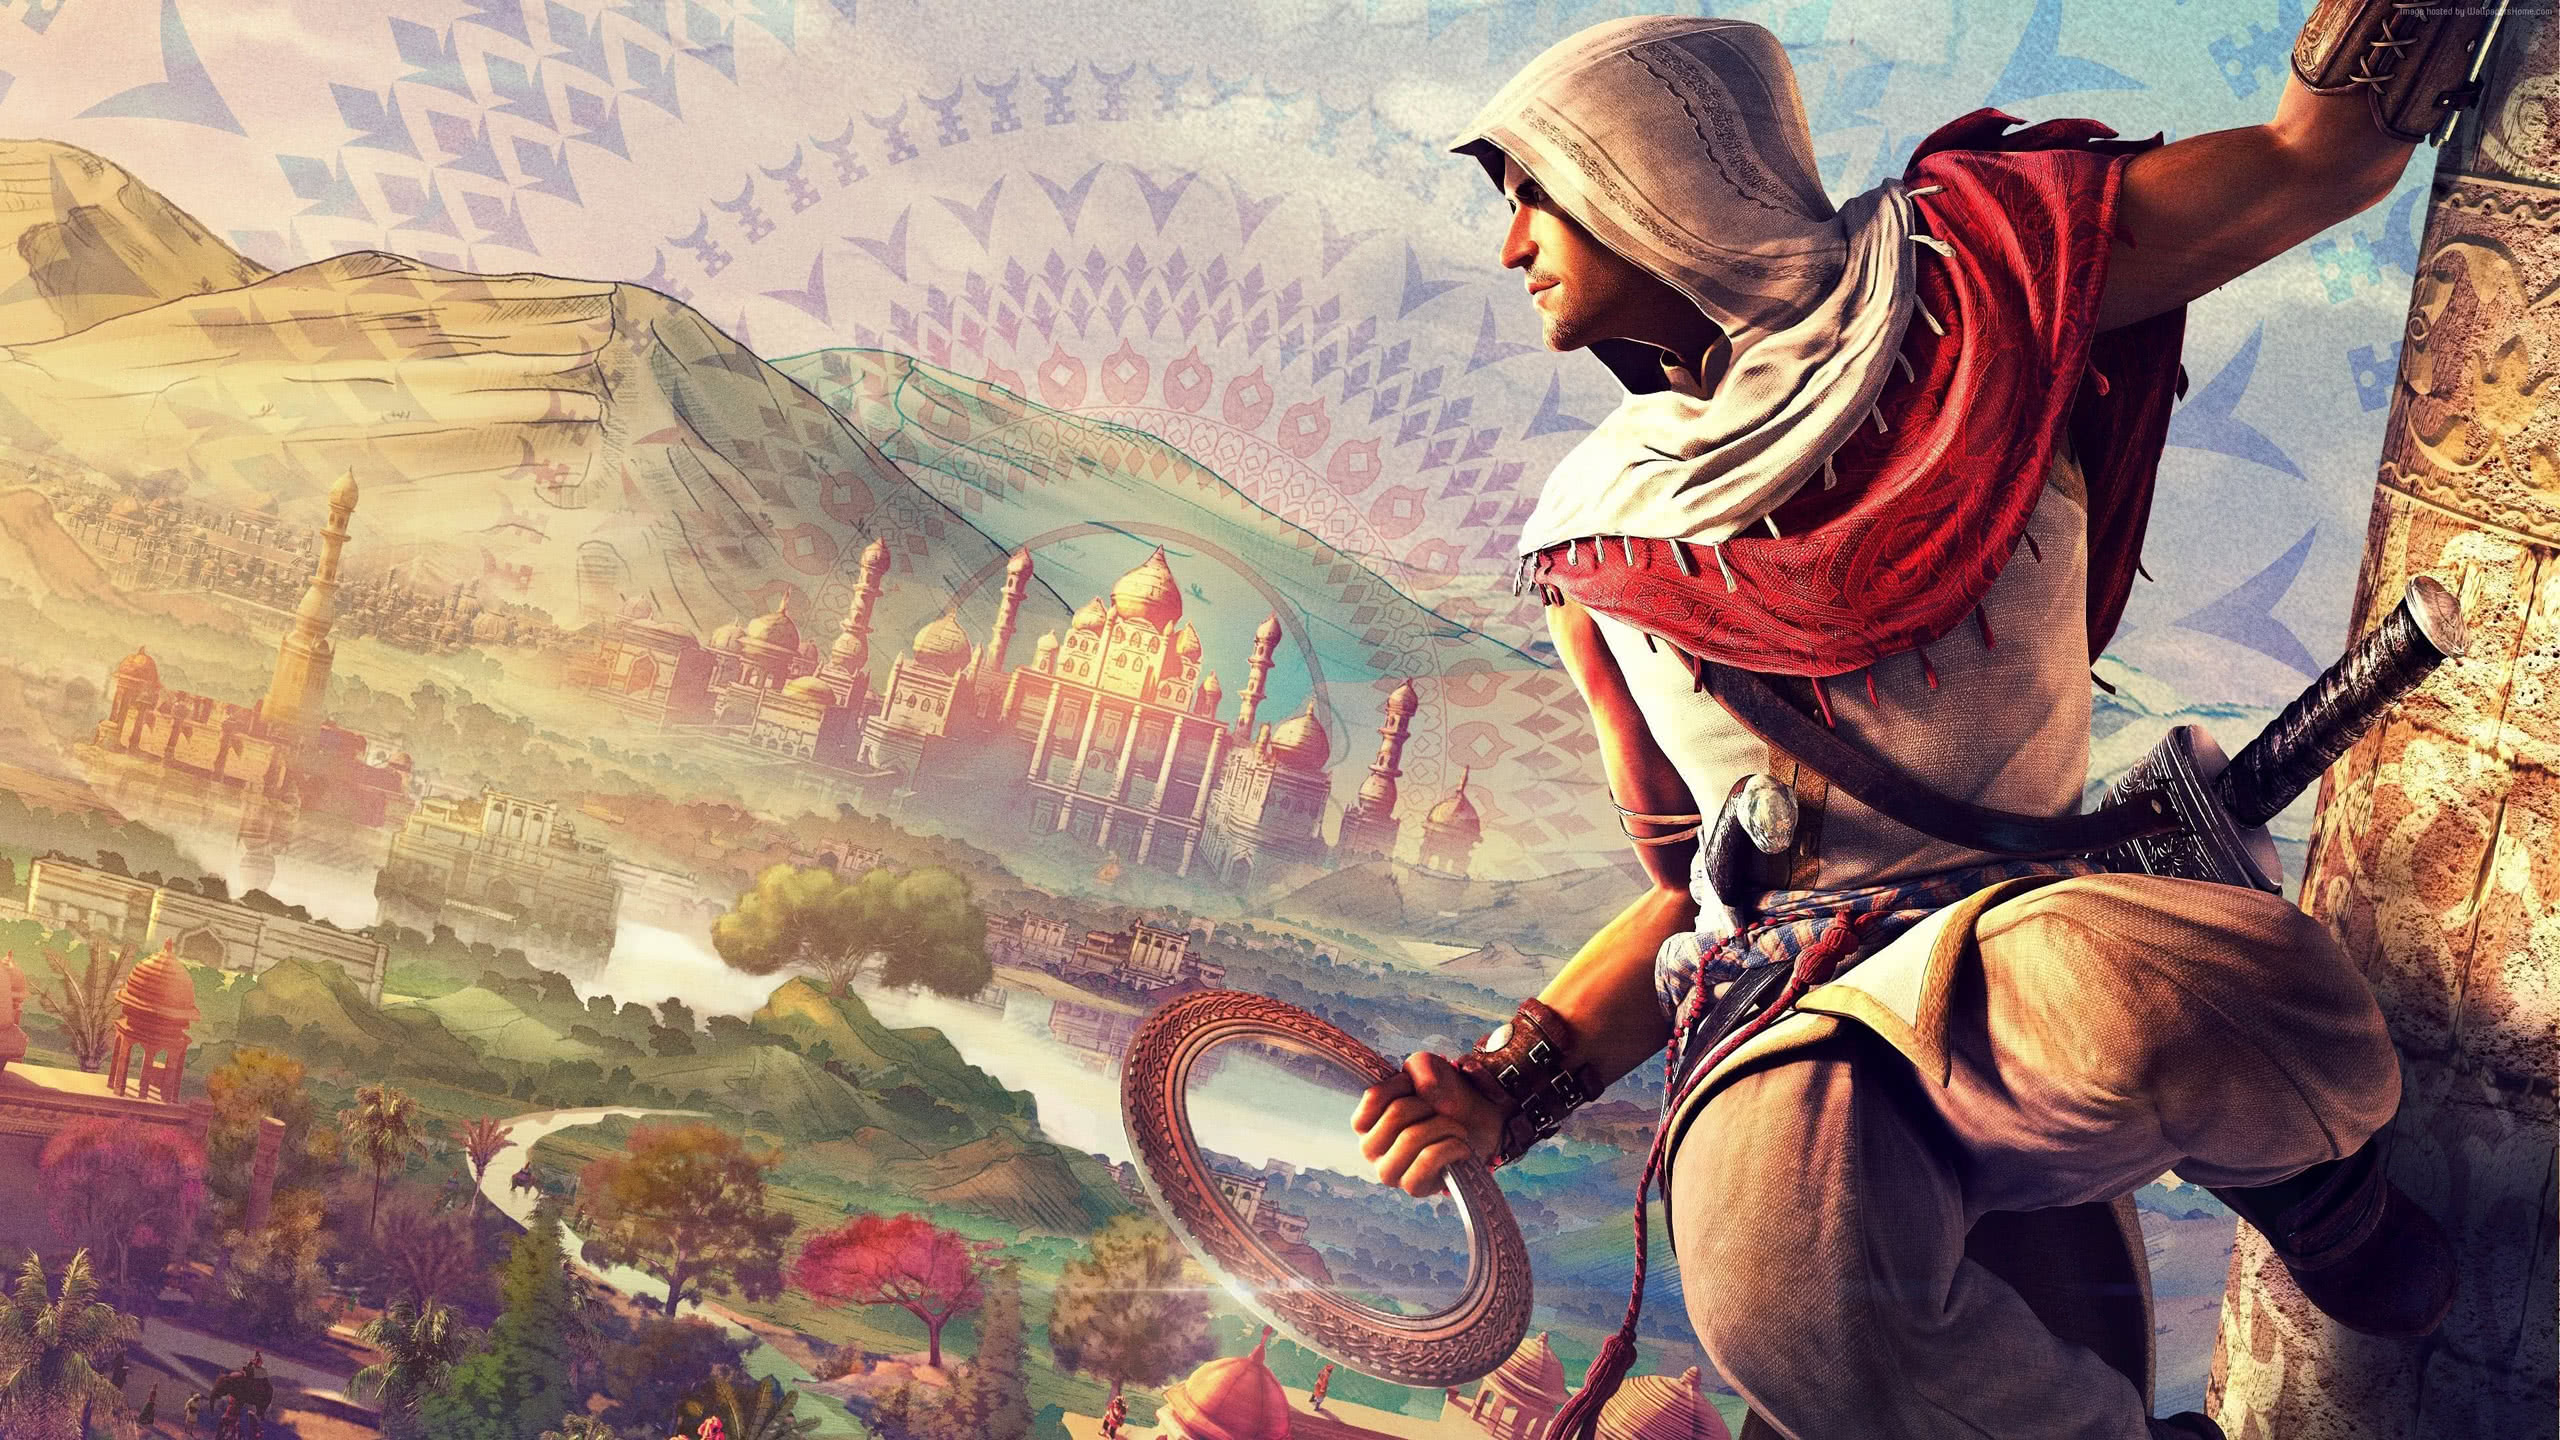 assassins creed chronicles india wqhd 1440p wallpaper